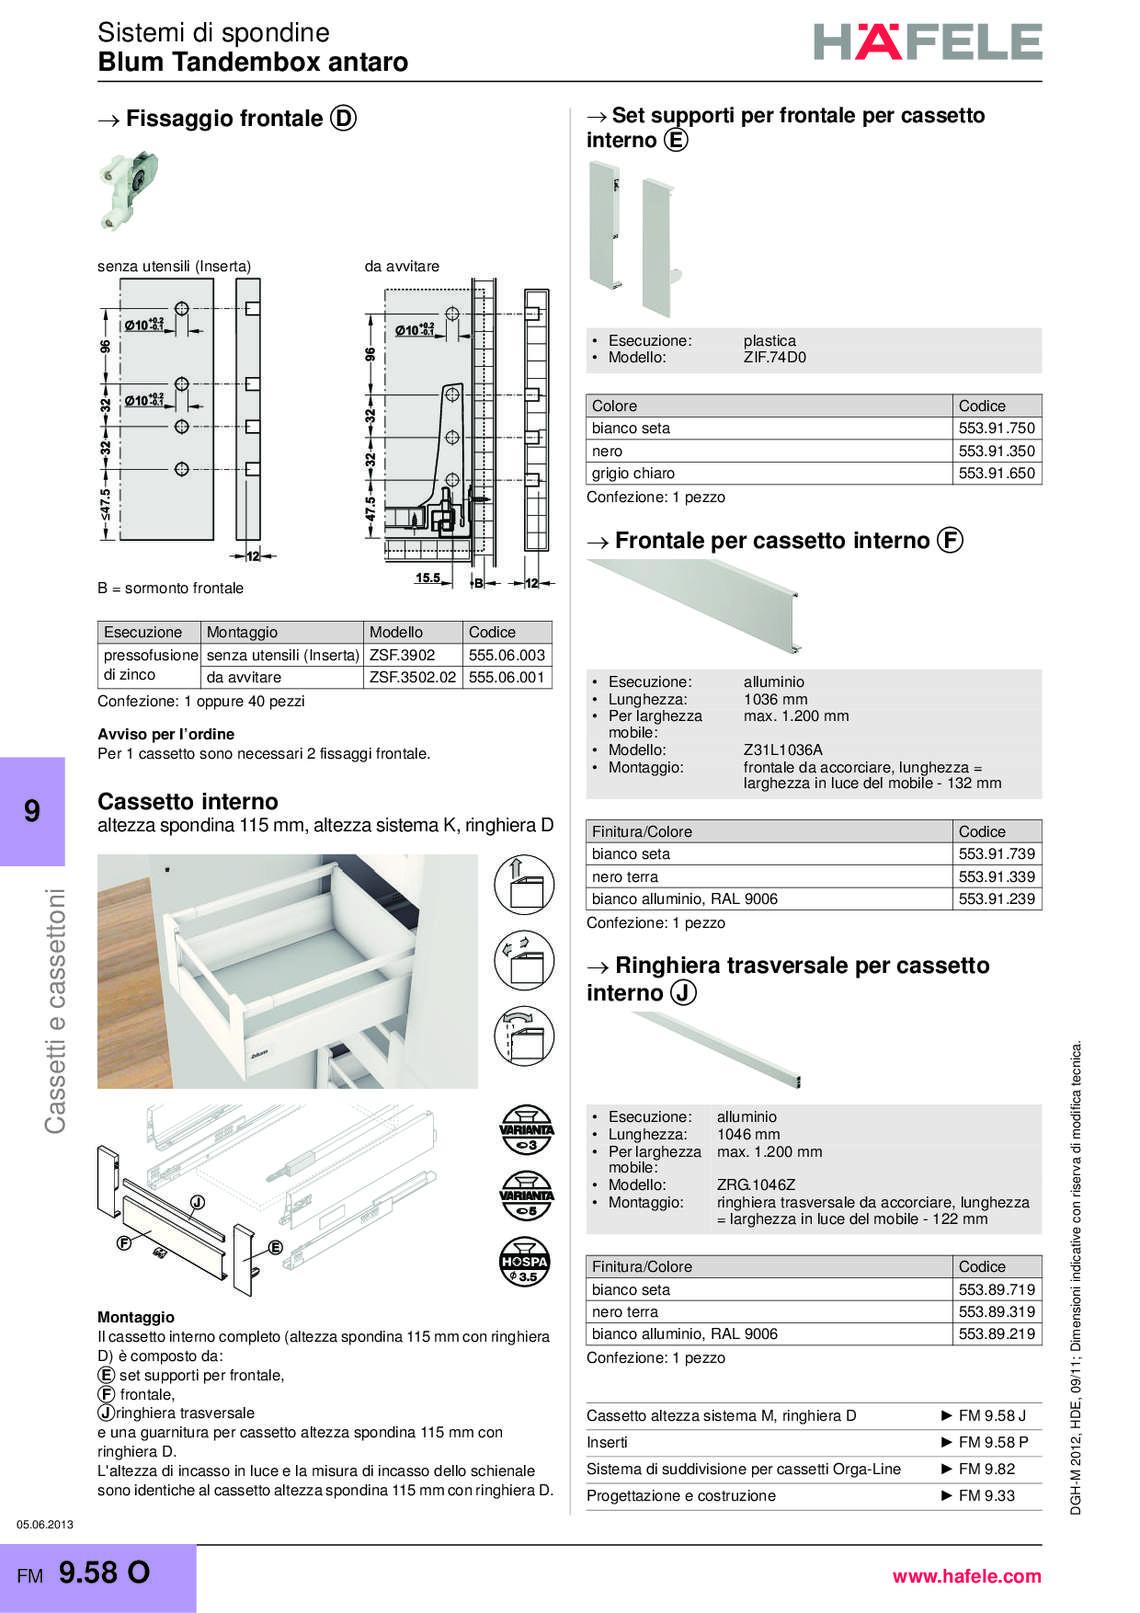 hafele-spondine-e-guide-per-mobili_40_089.jpg